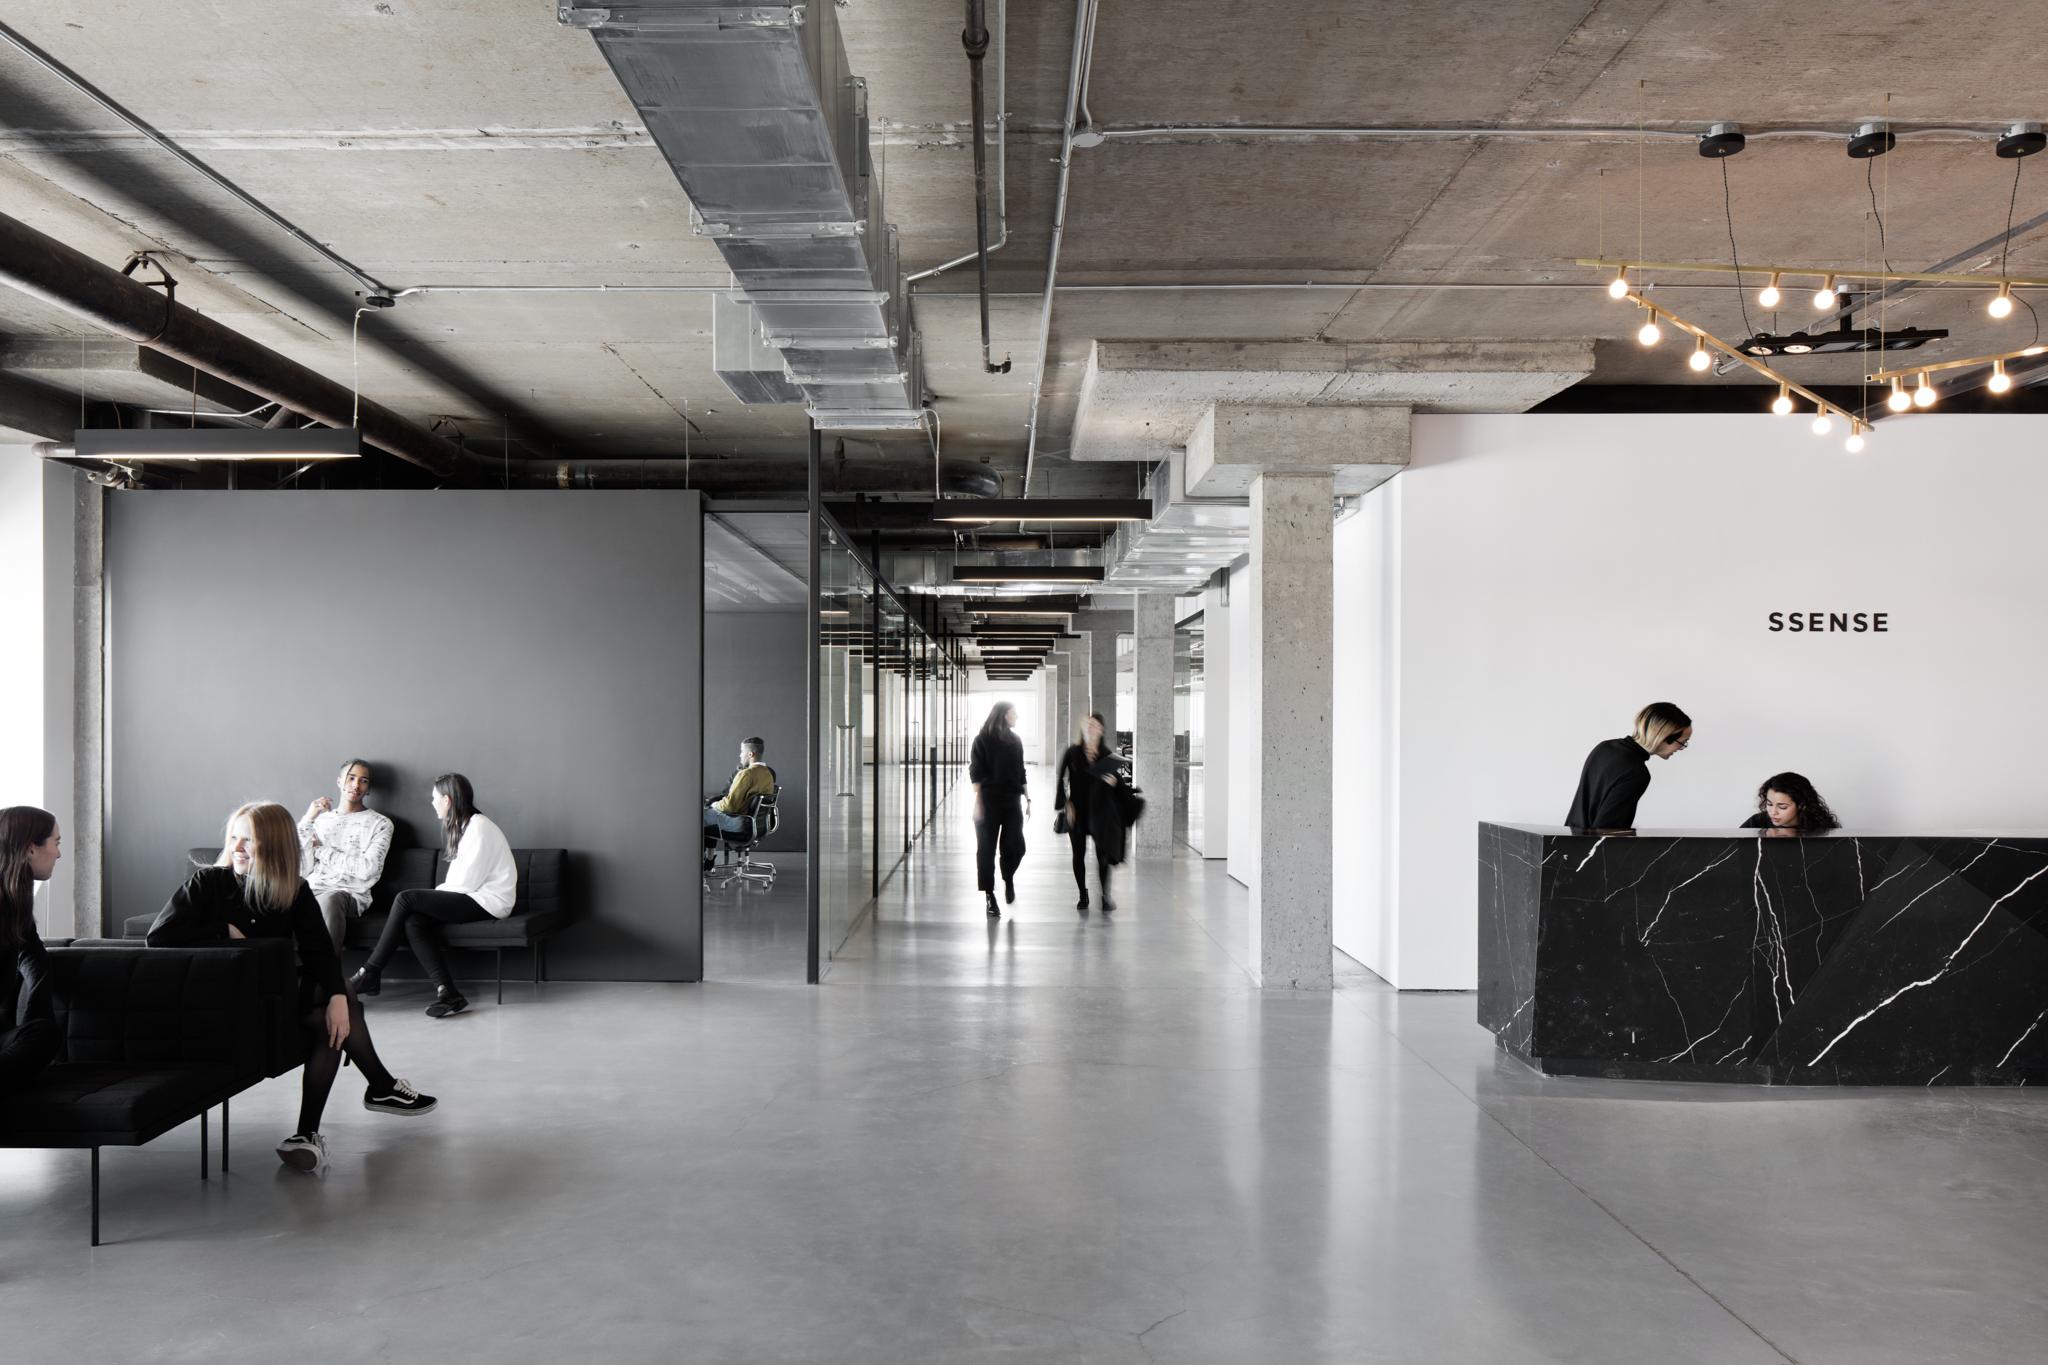 ssense offices